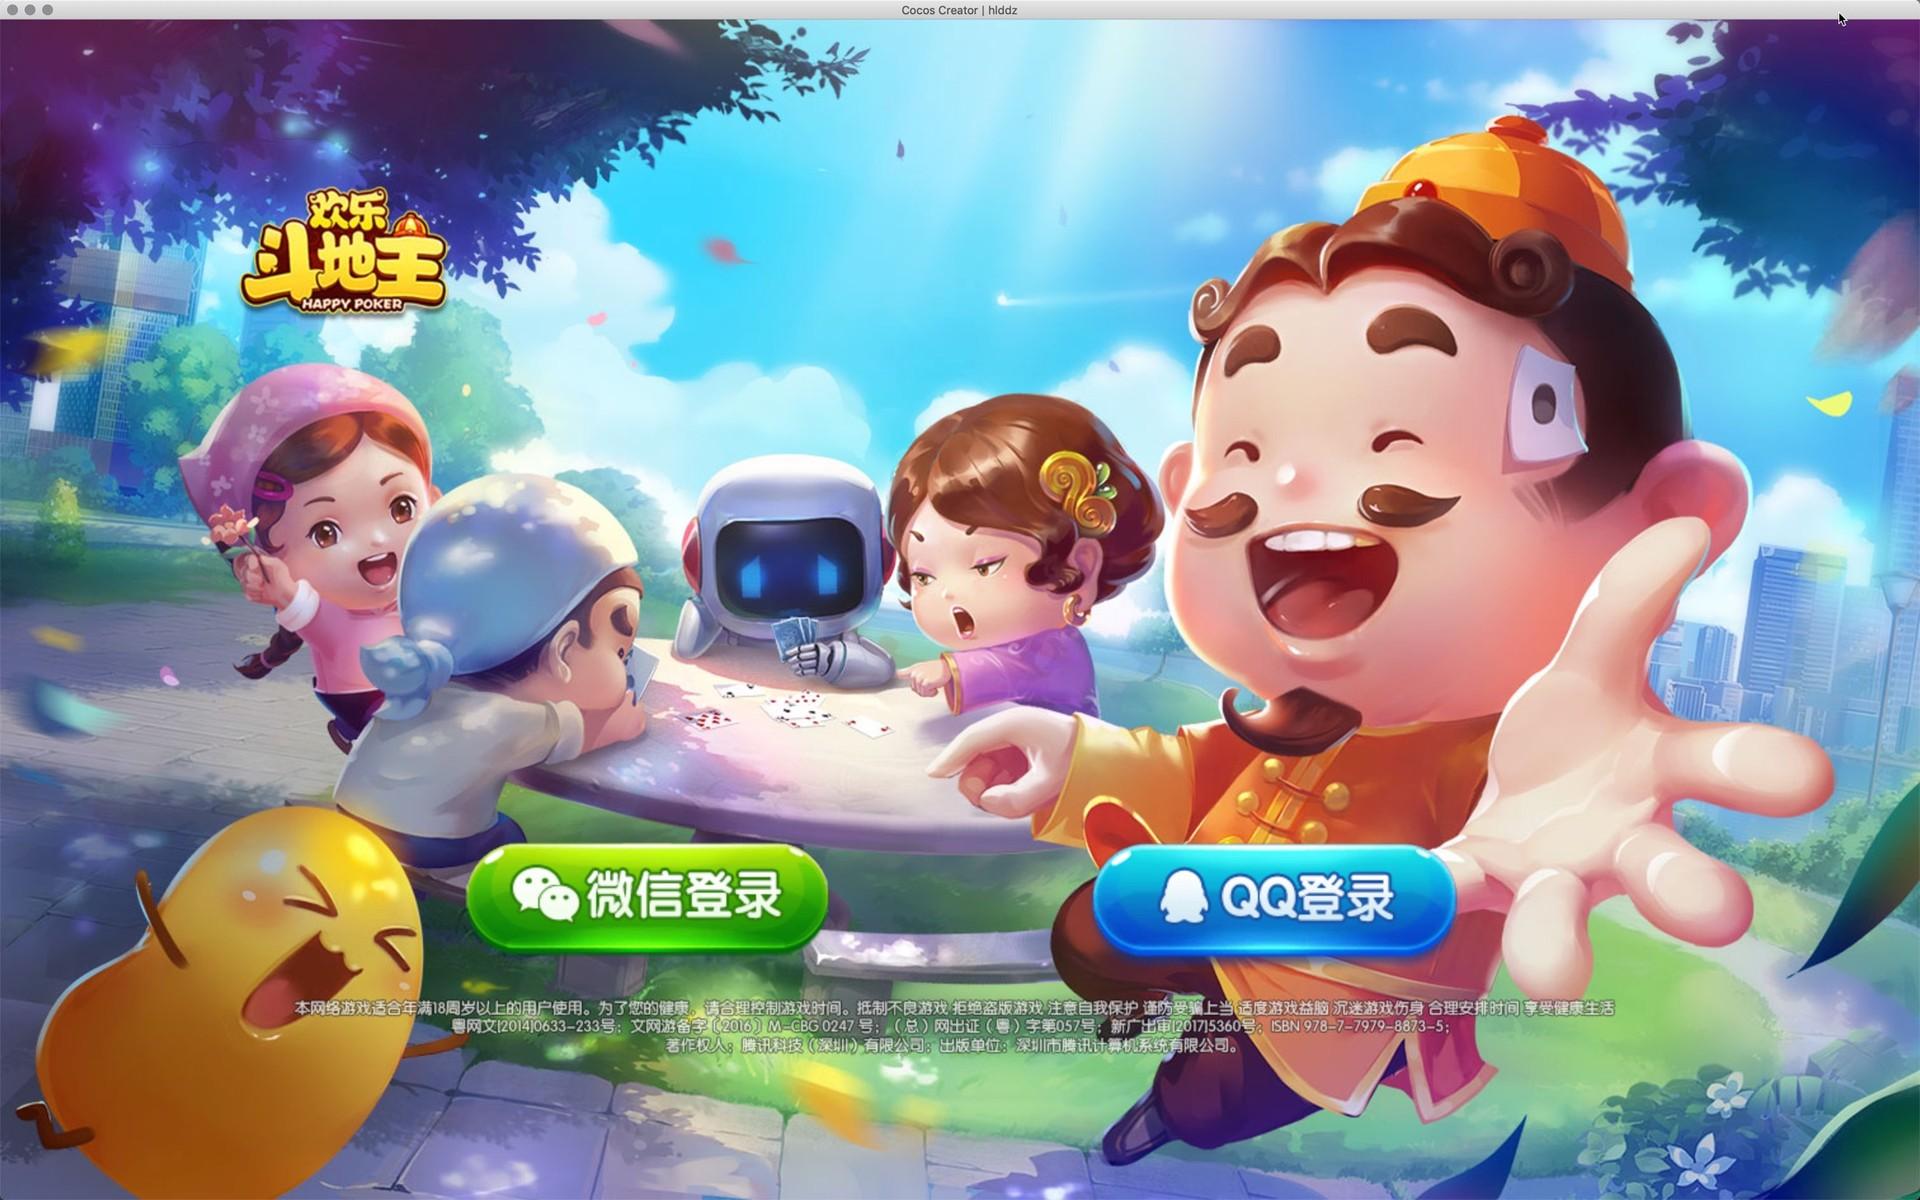 欢乐斗地主 for mac 1.0.5中文版